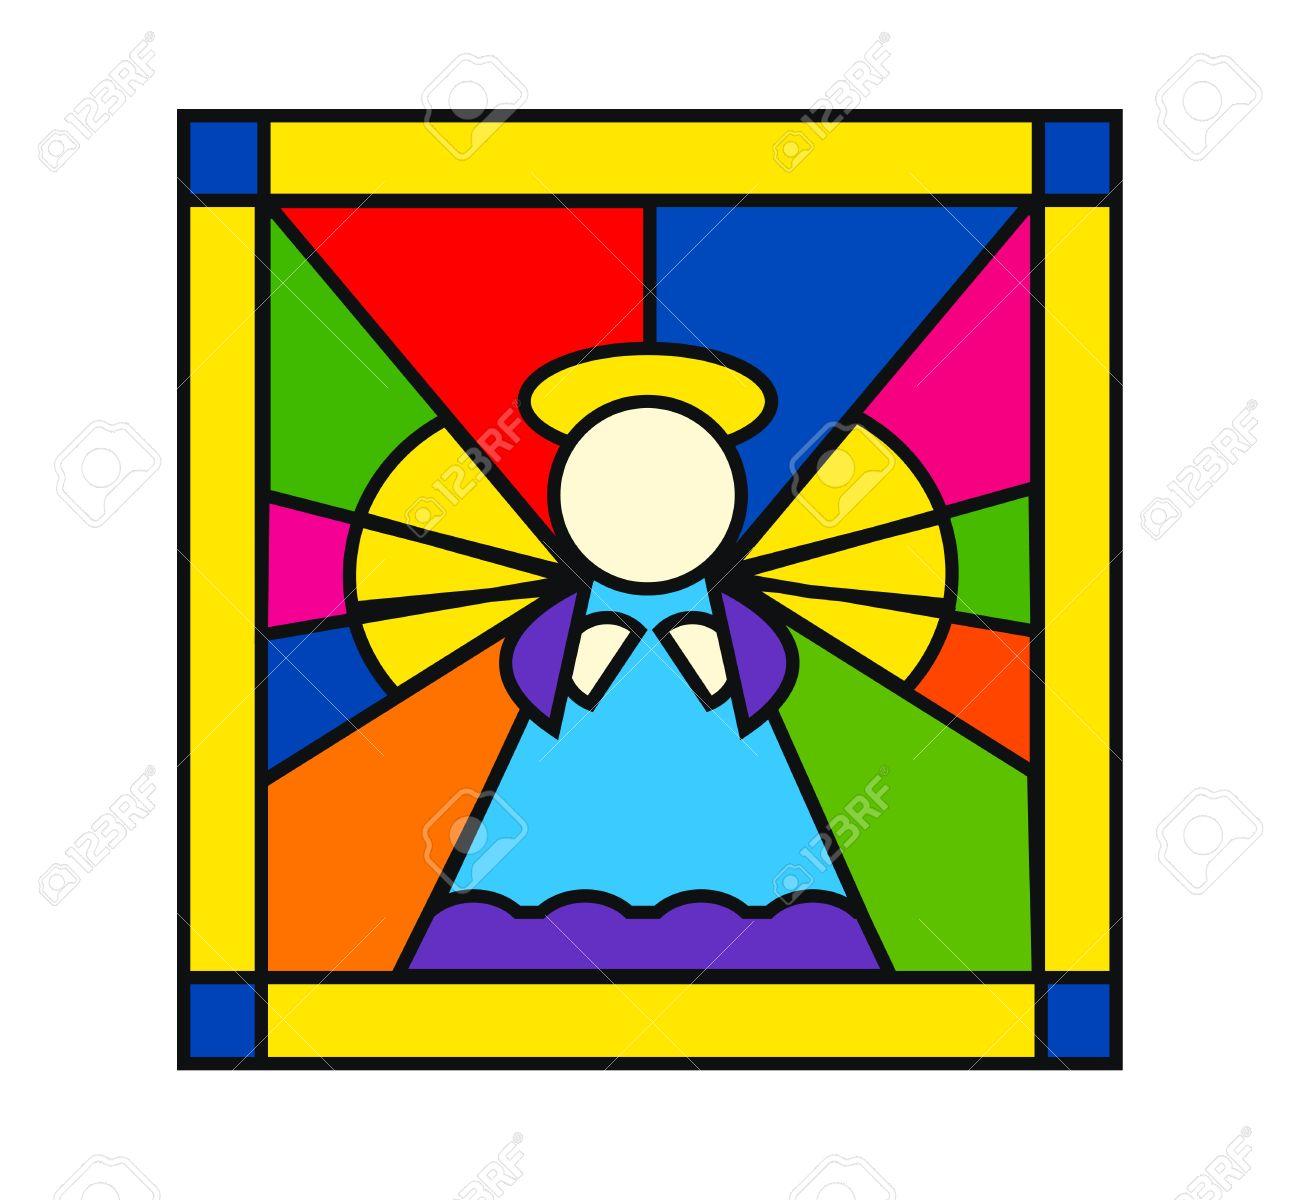 Glas In Lood Engels.Mooie Illustratie Van Engel In Glas In Lood Gea Soleerd Op Een Witte